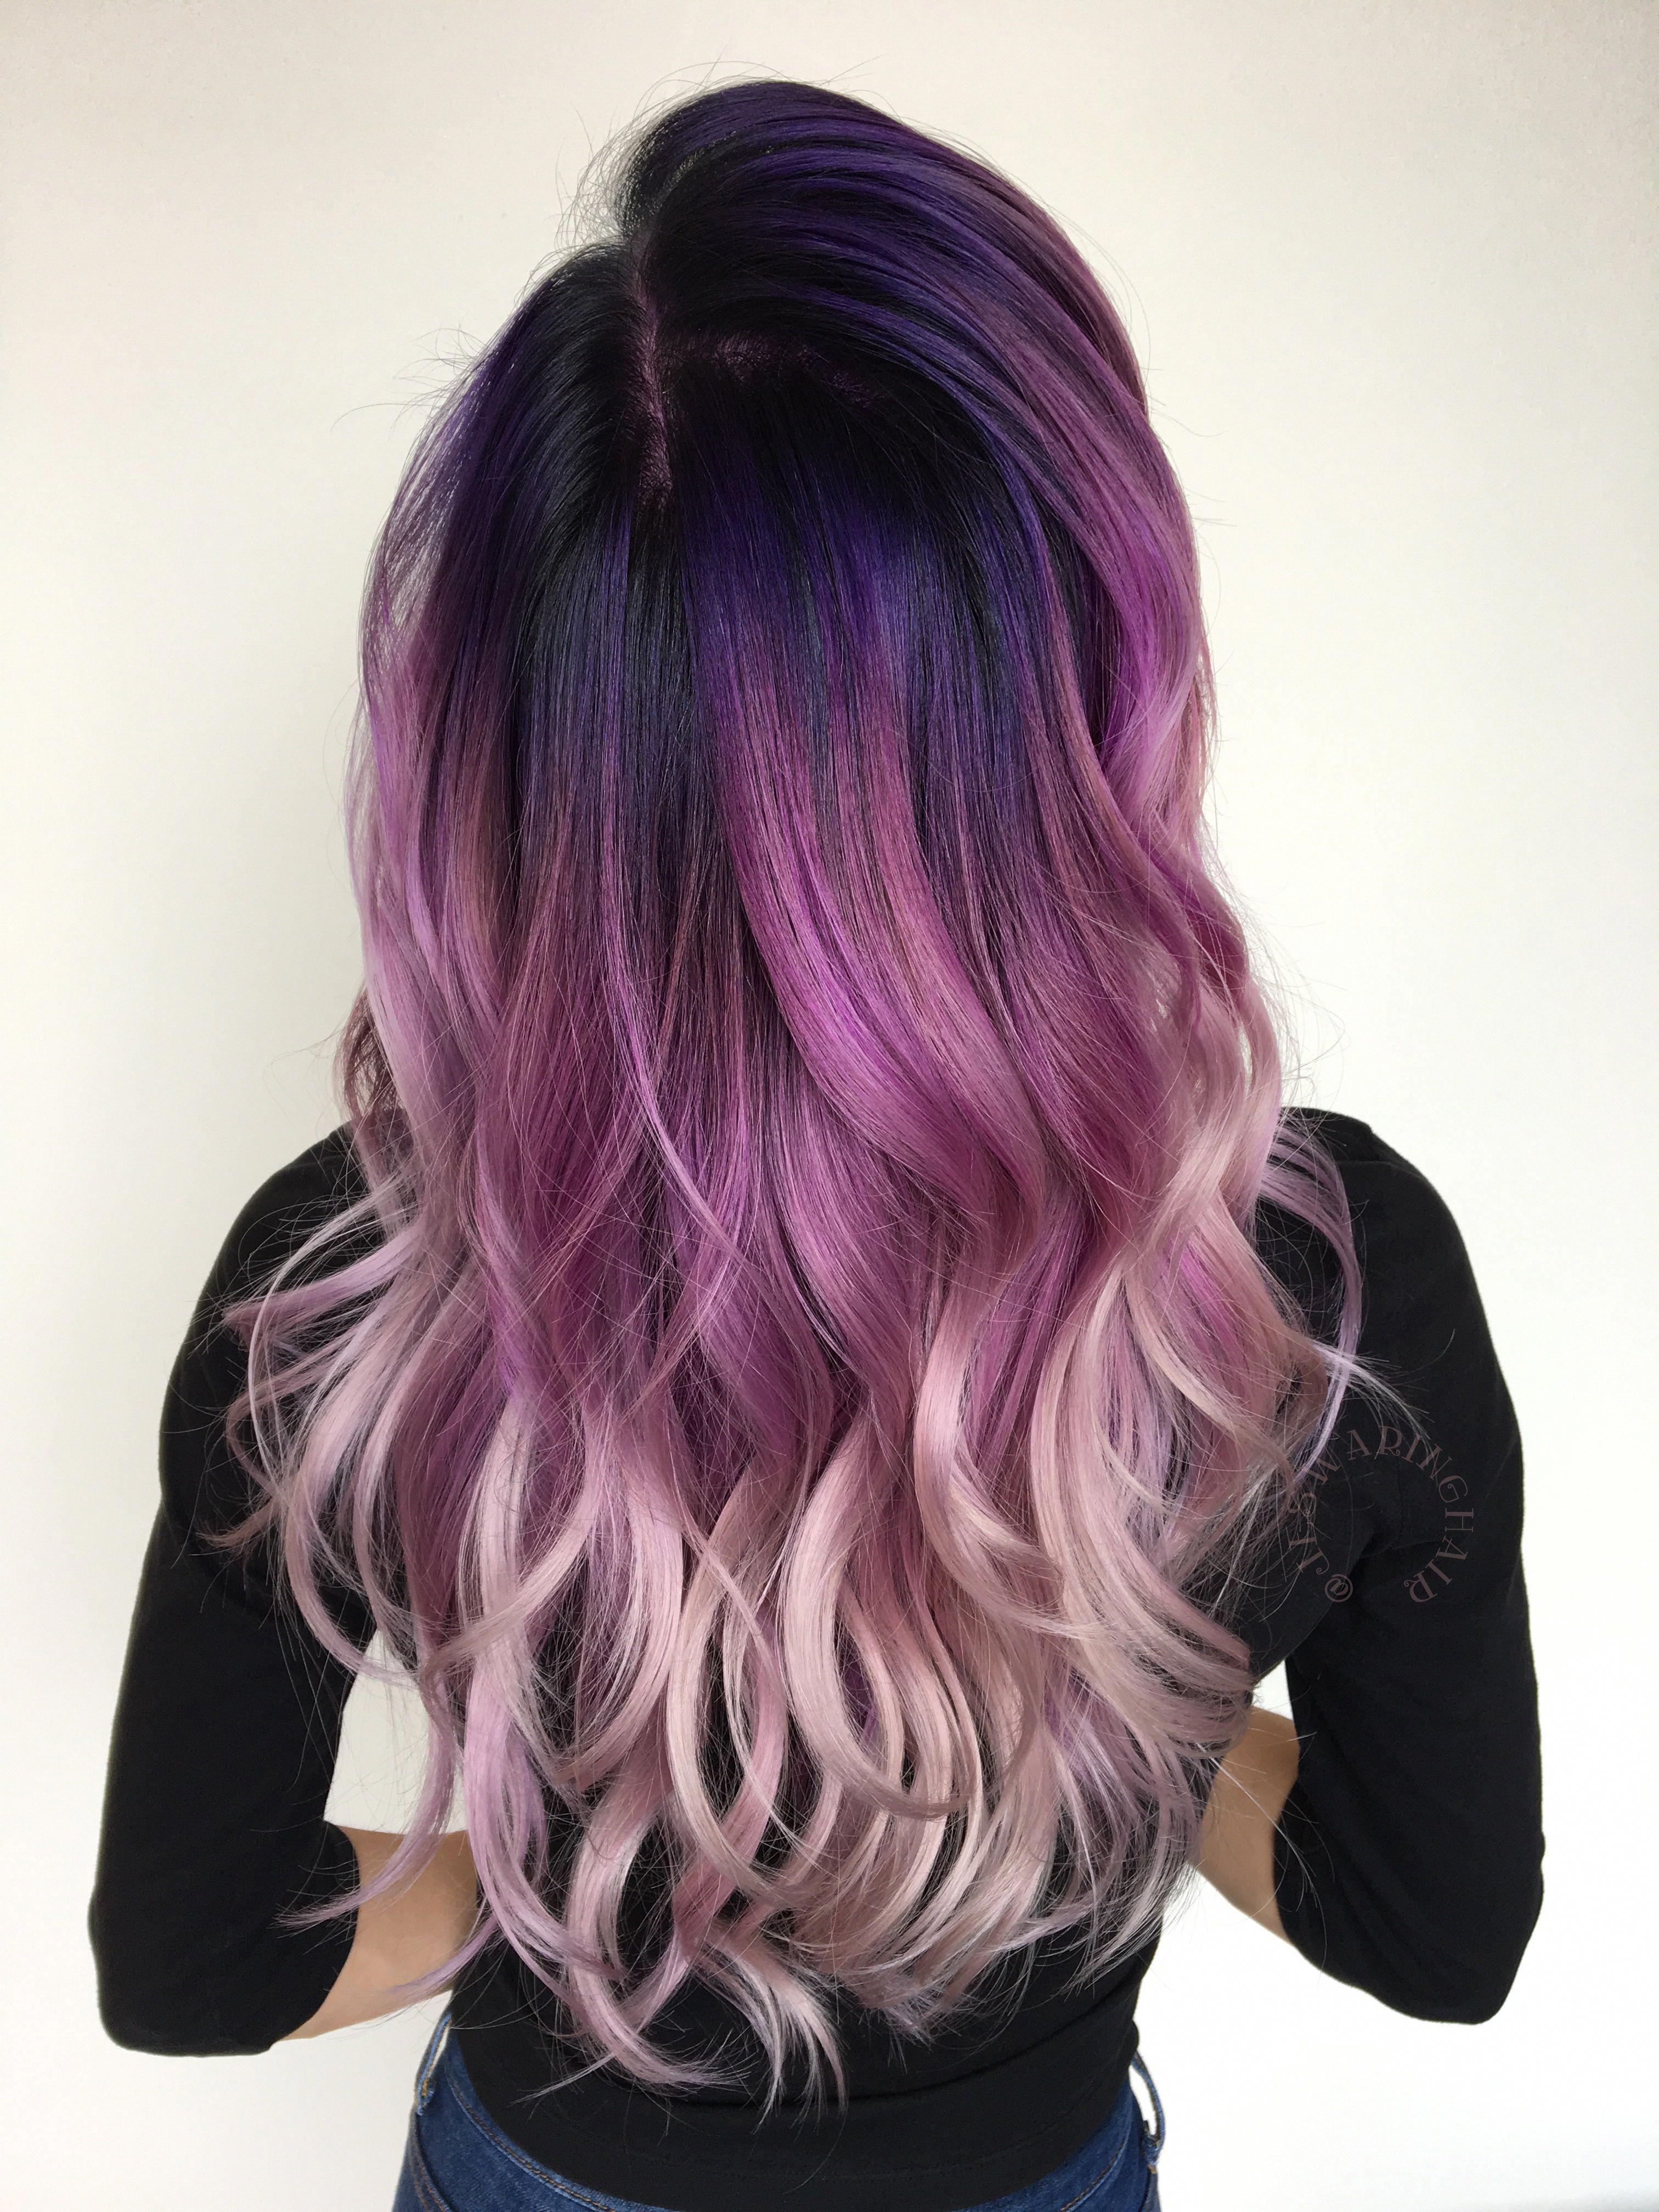 Hair Dye Men Dark Brown Hair Dye Orange Permanent Haircrush Hairbrained Hairdye Dyed Hair Purple Hair Hair Color Purple